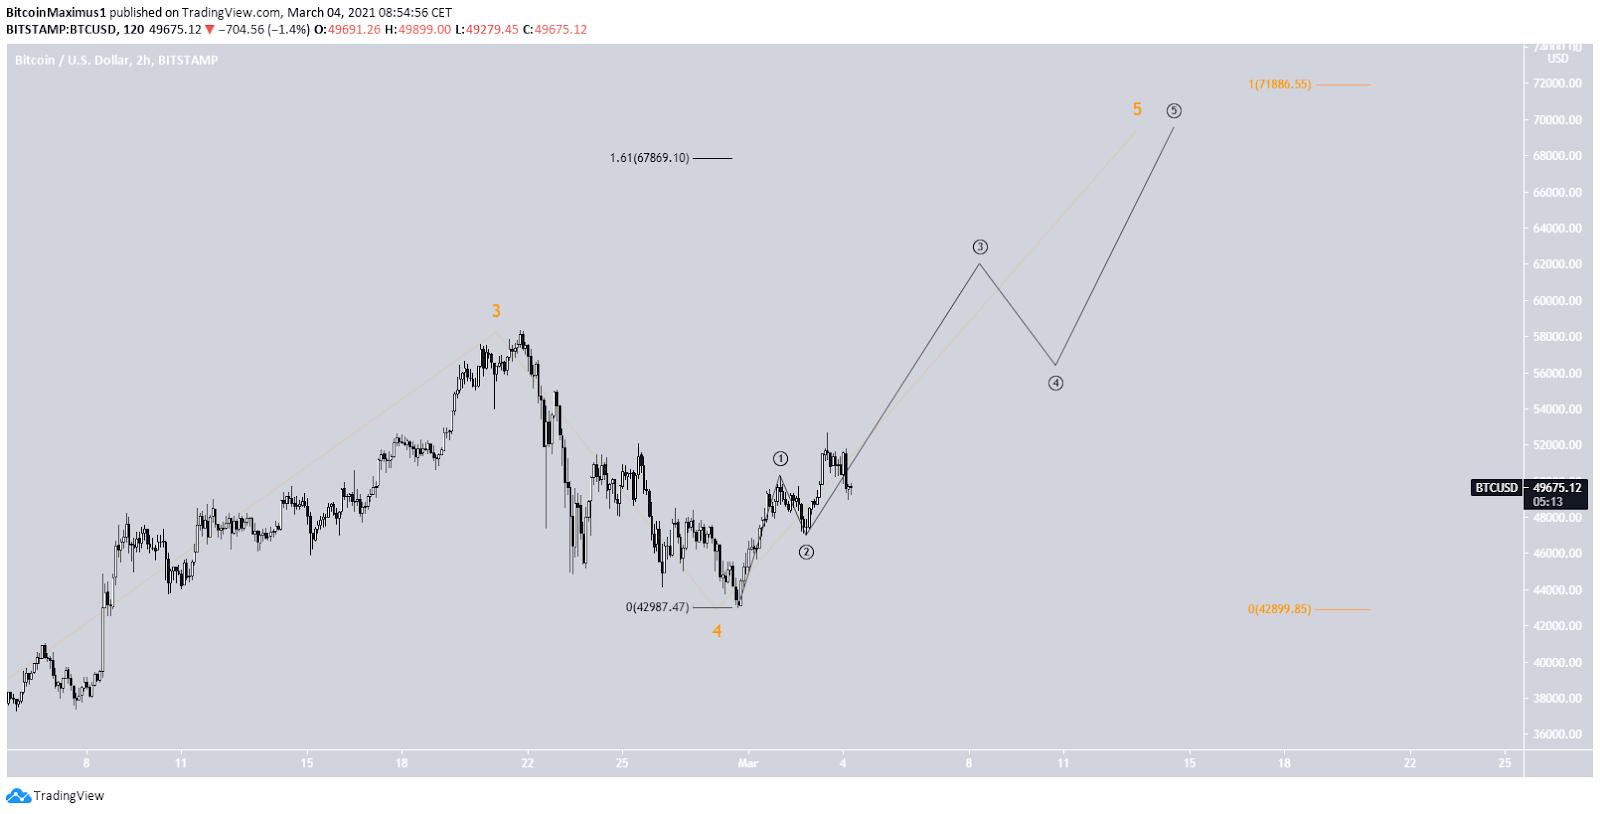 Bitcoin Preis Wellenanalyse 2 Stunden Chart